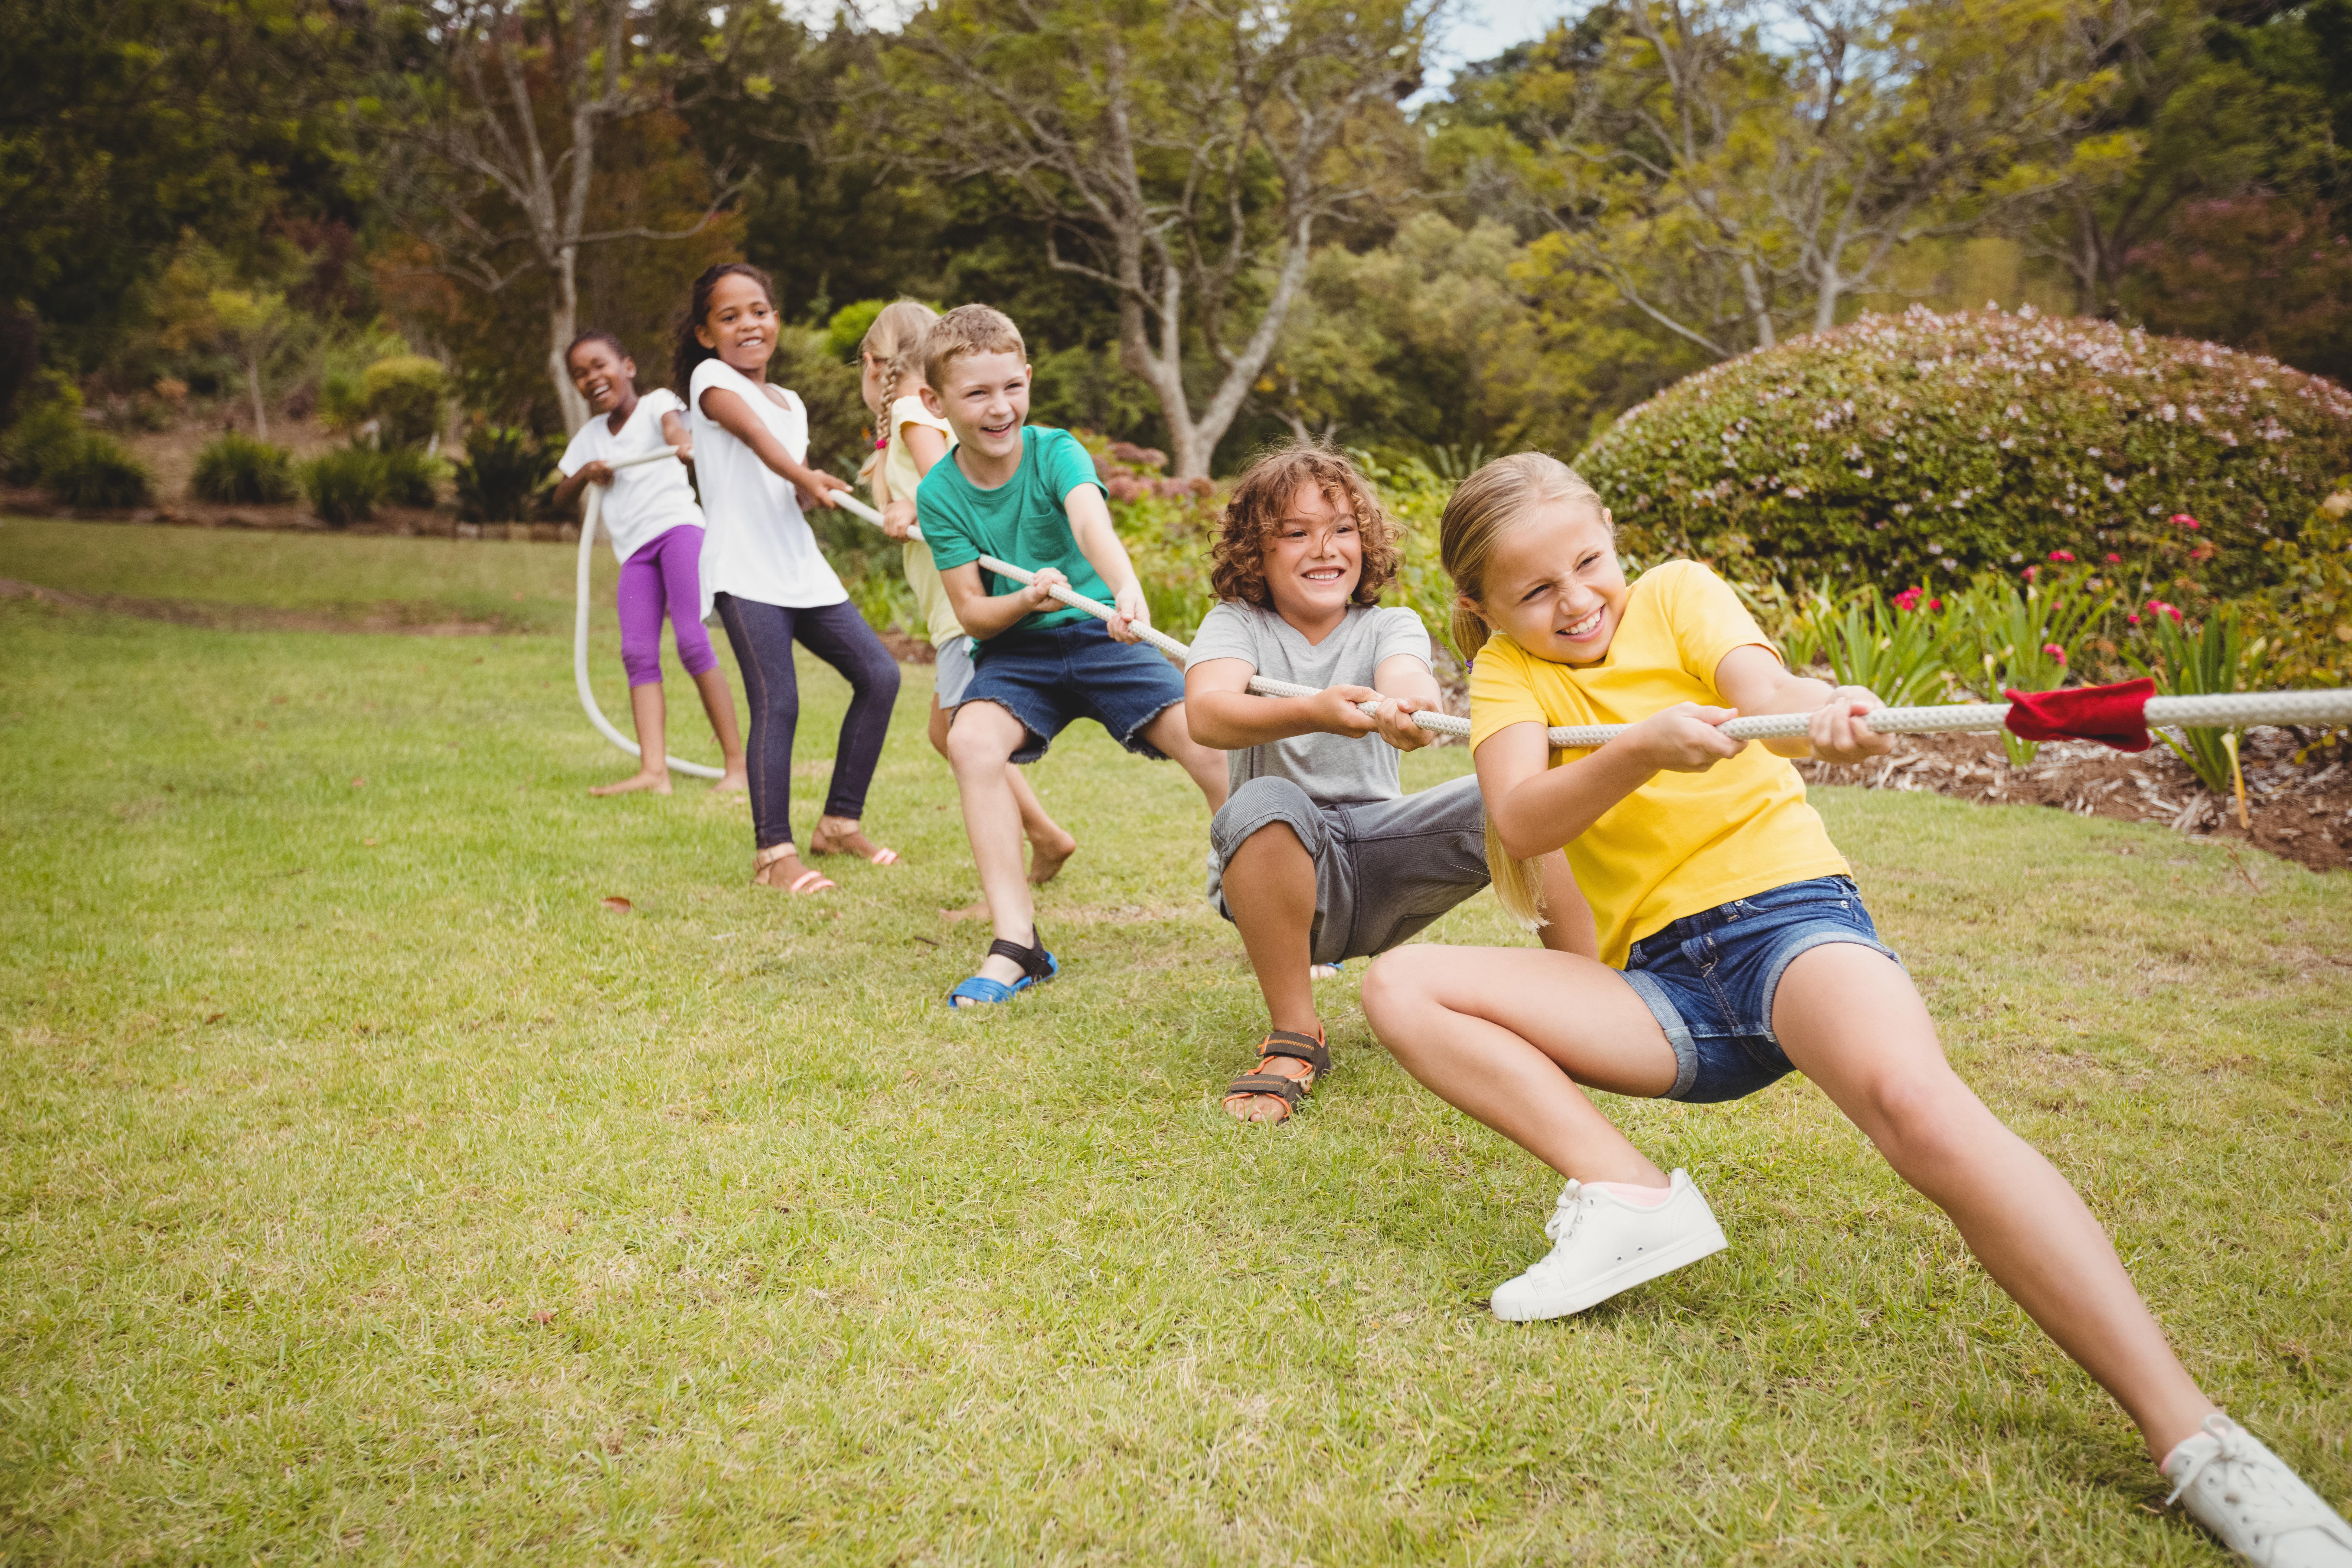 bigstock-Children-pulling-a-rope-in-tug-169481348.jpg